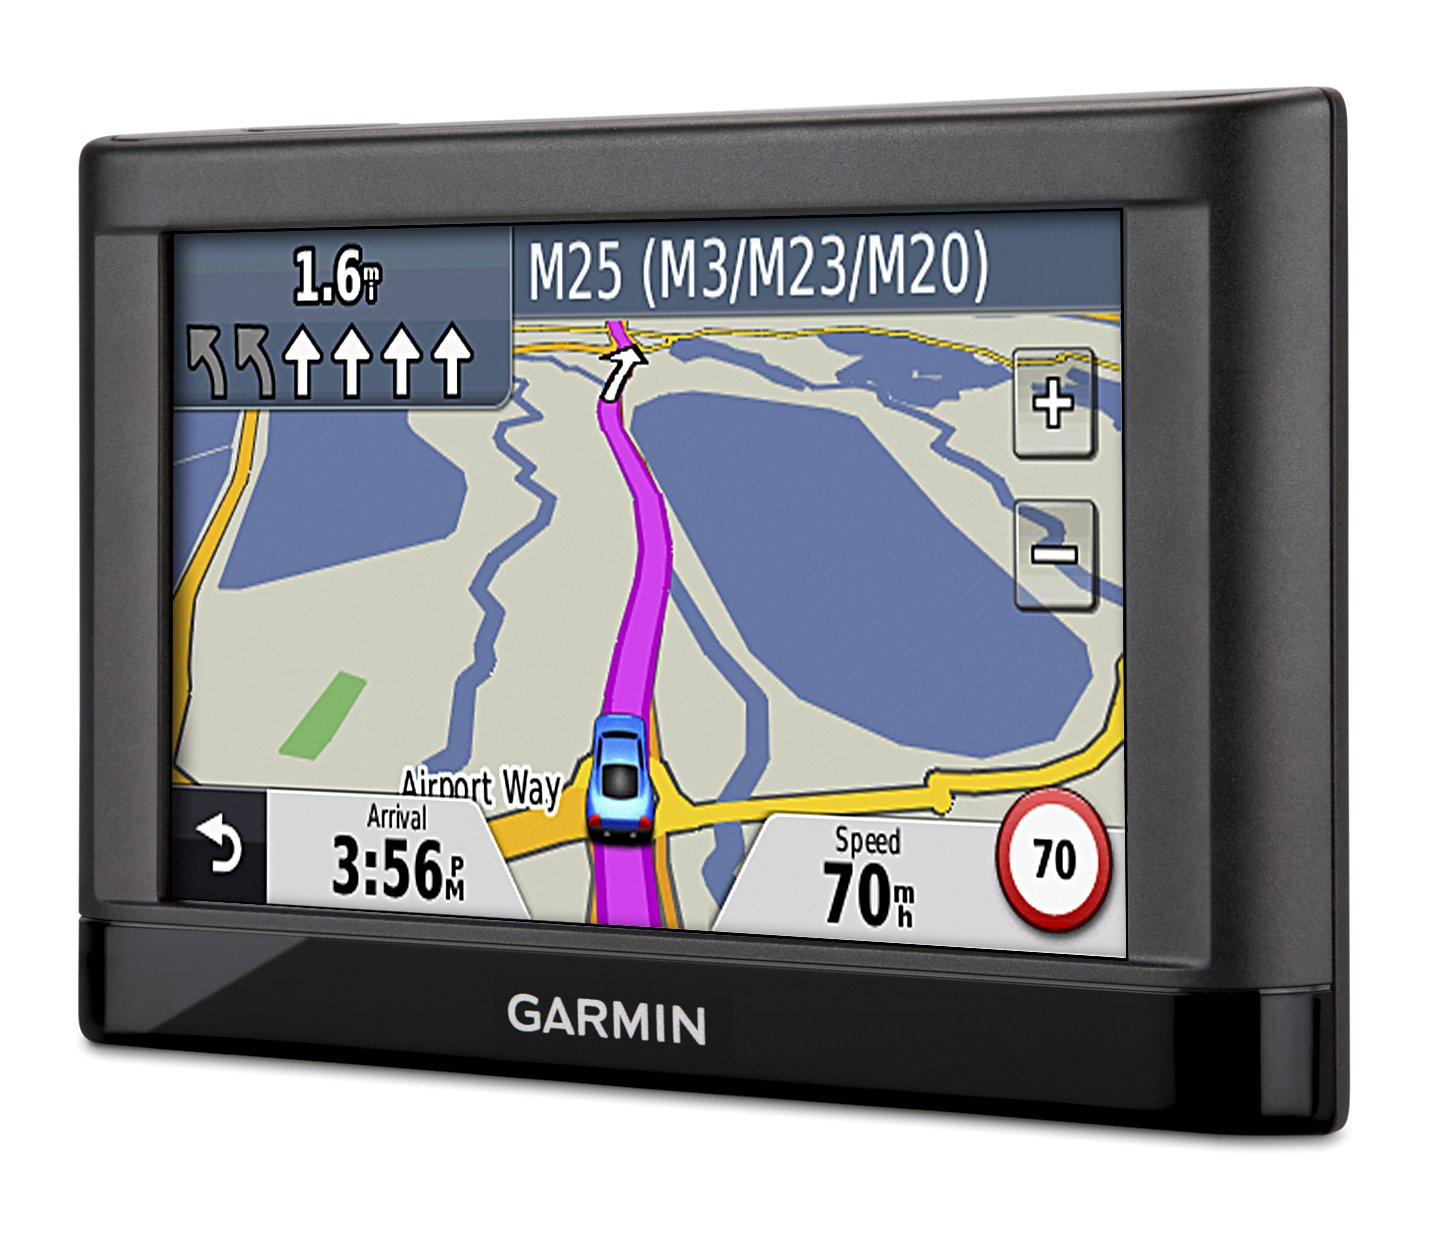 garmin nuvi 42lm 4 3 inch satellite navigation with uk and ireland maps and free lifetime map updates amazon co uk electronics